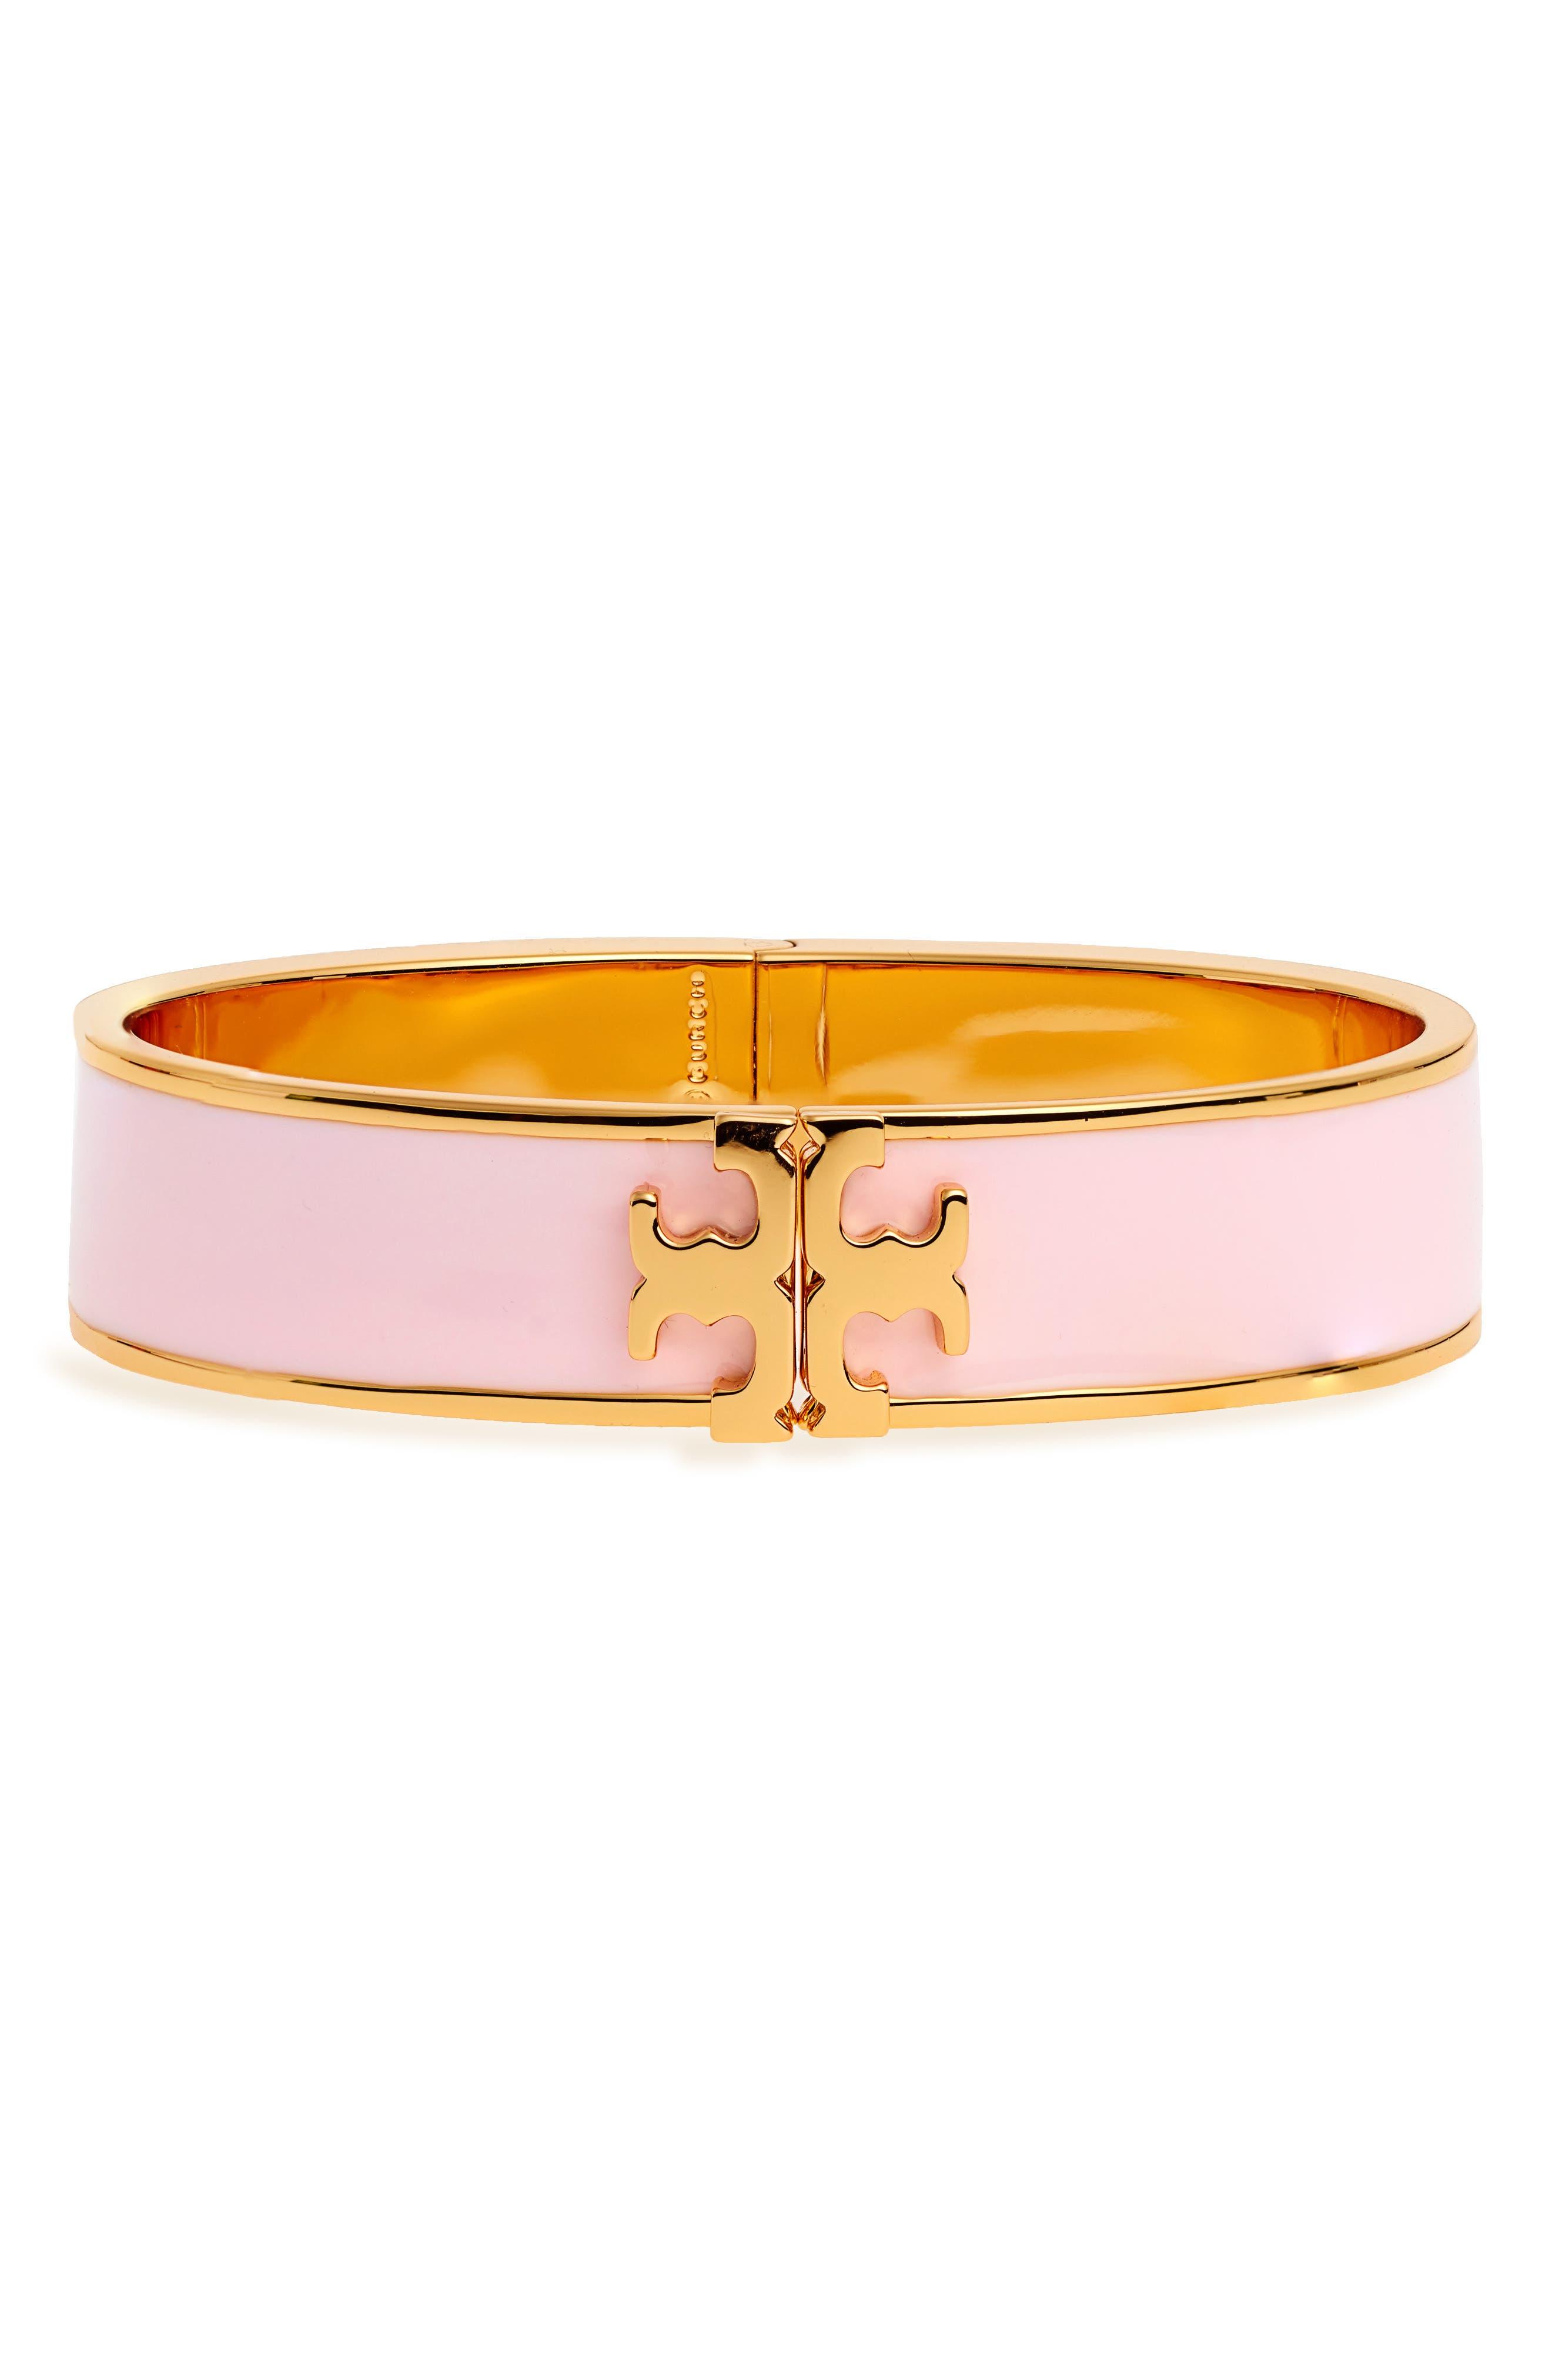 Raised Logo Enamel Hinge Bracelet,                             Main thumbnail 1, color,                             LOTUS PINK/ TORY GOLD